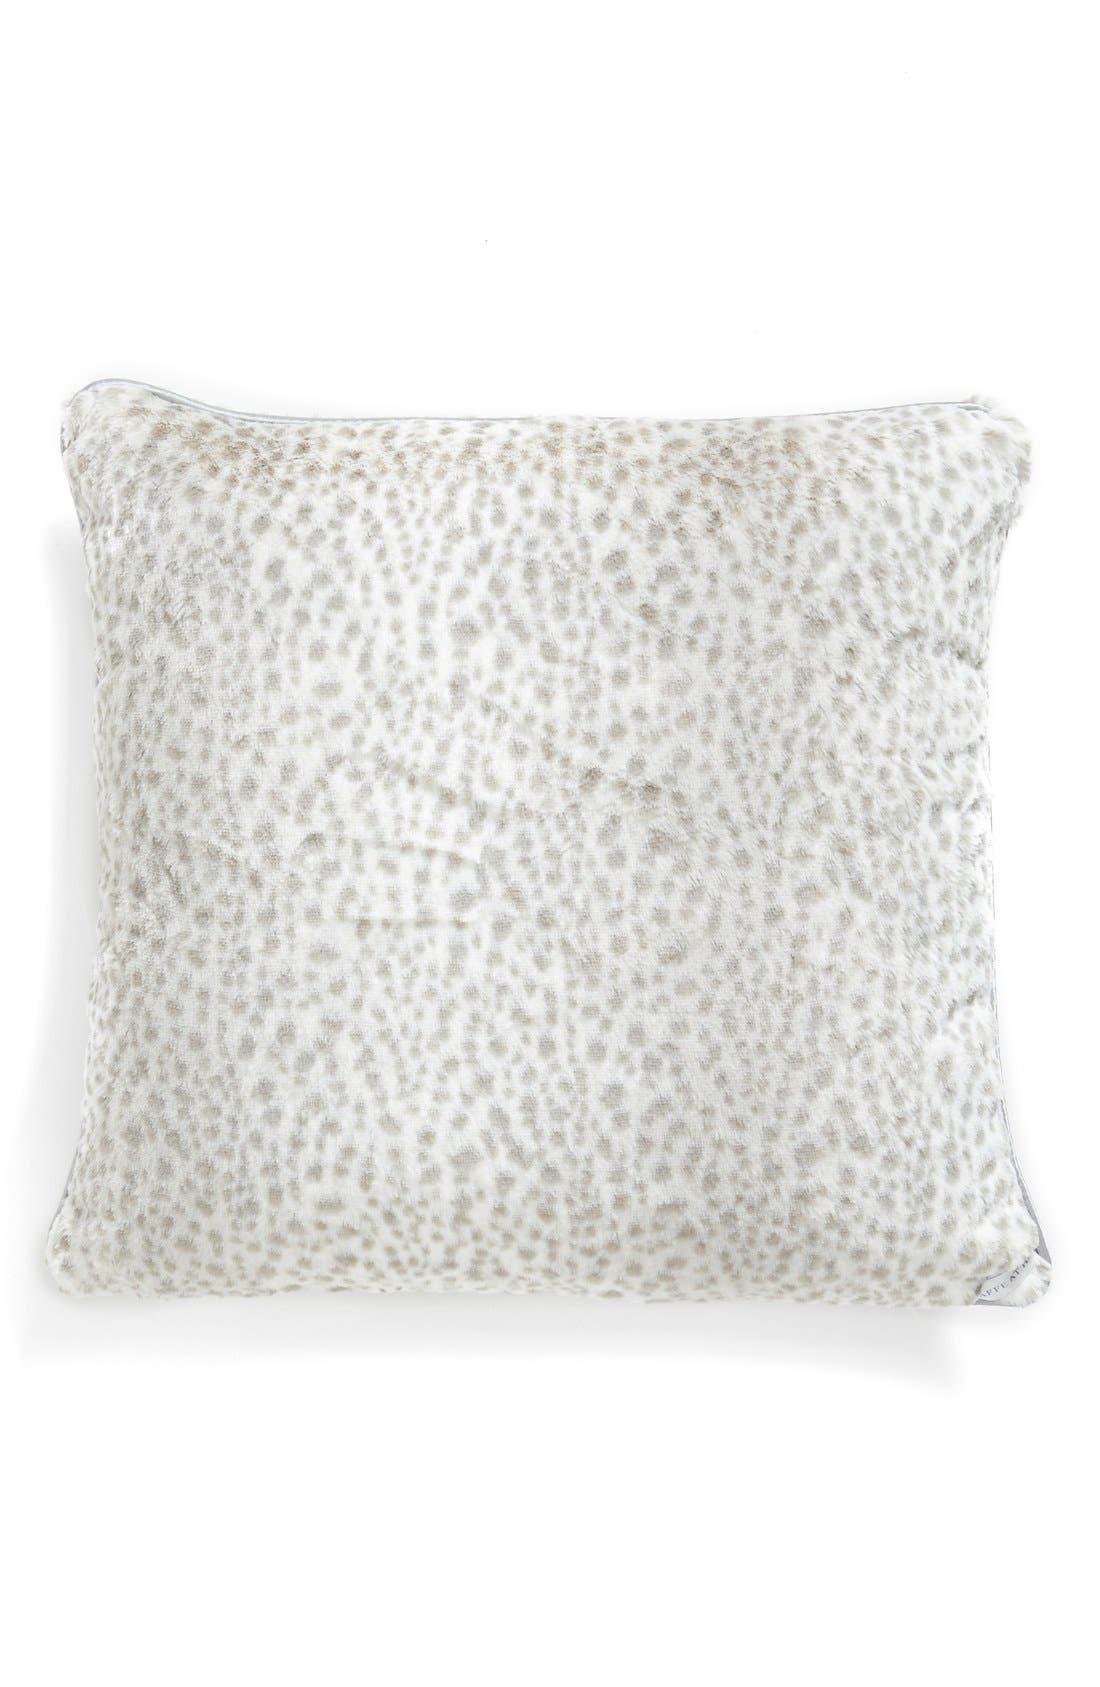 'Snow Leopard' Faux Fur Throw Pillow,                             Main thumbnail 1, color,                             Silver